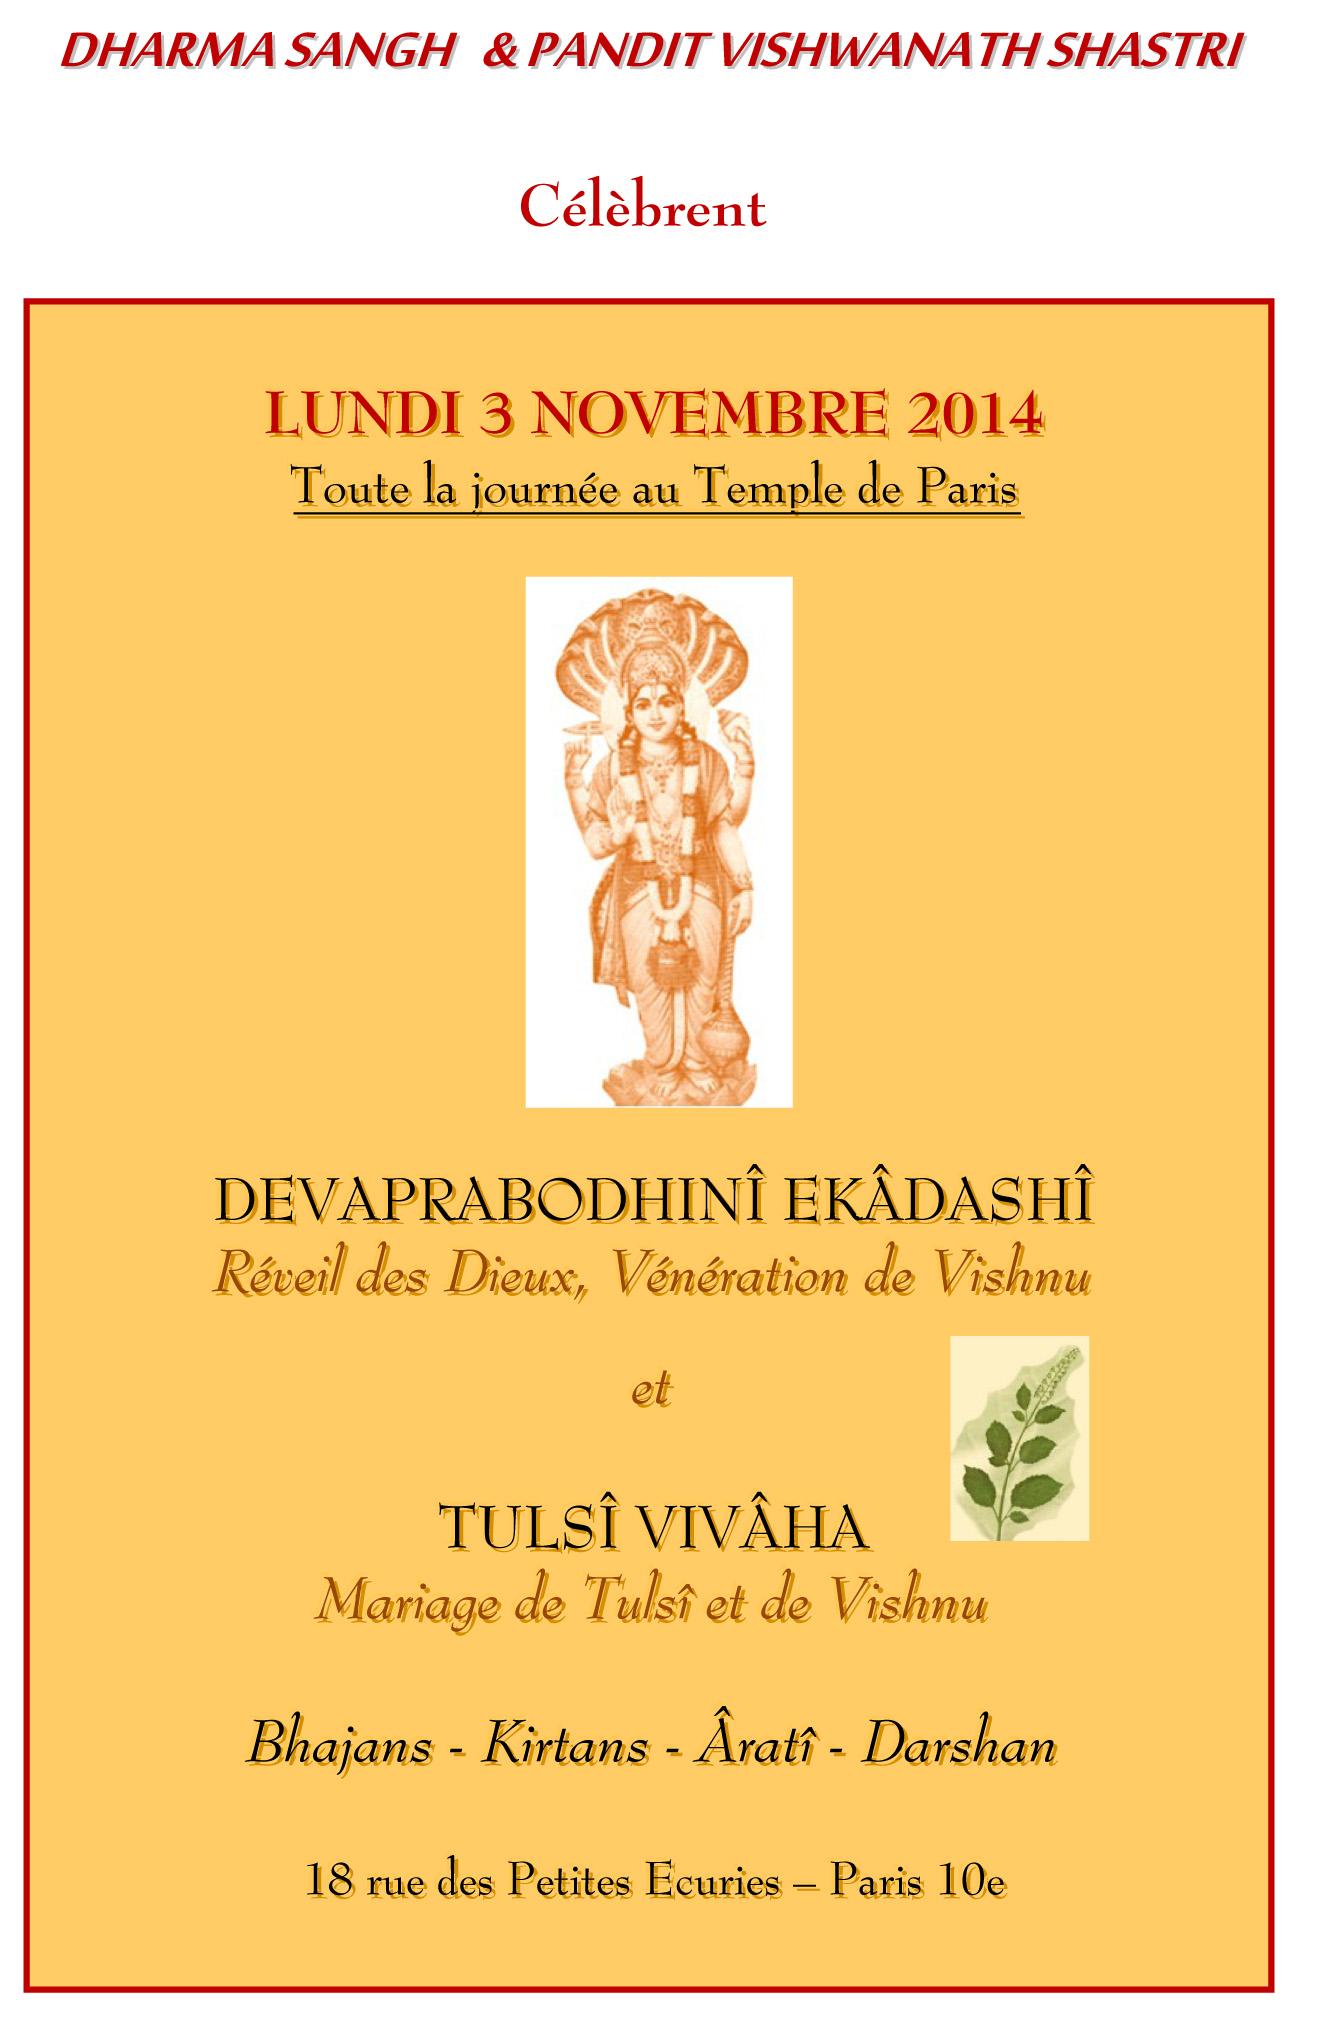 affiche annonce fête devaprabodhini ekadashi